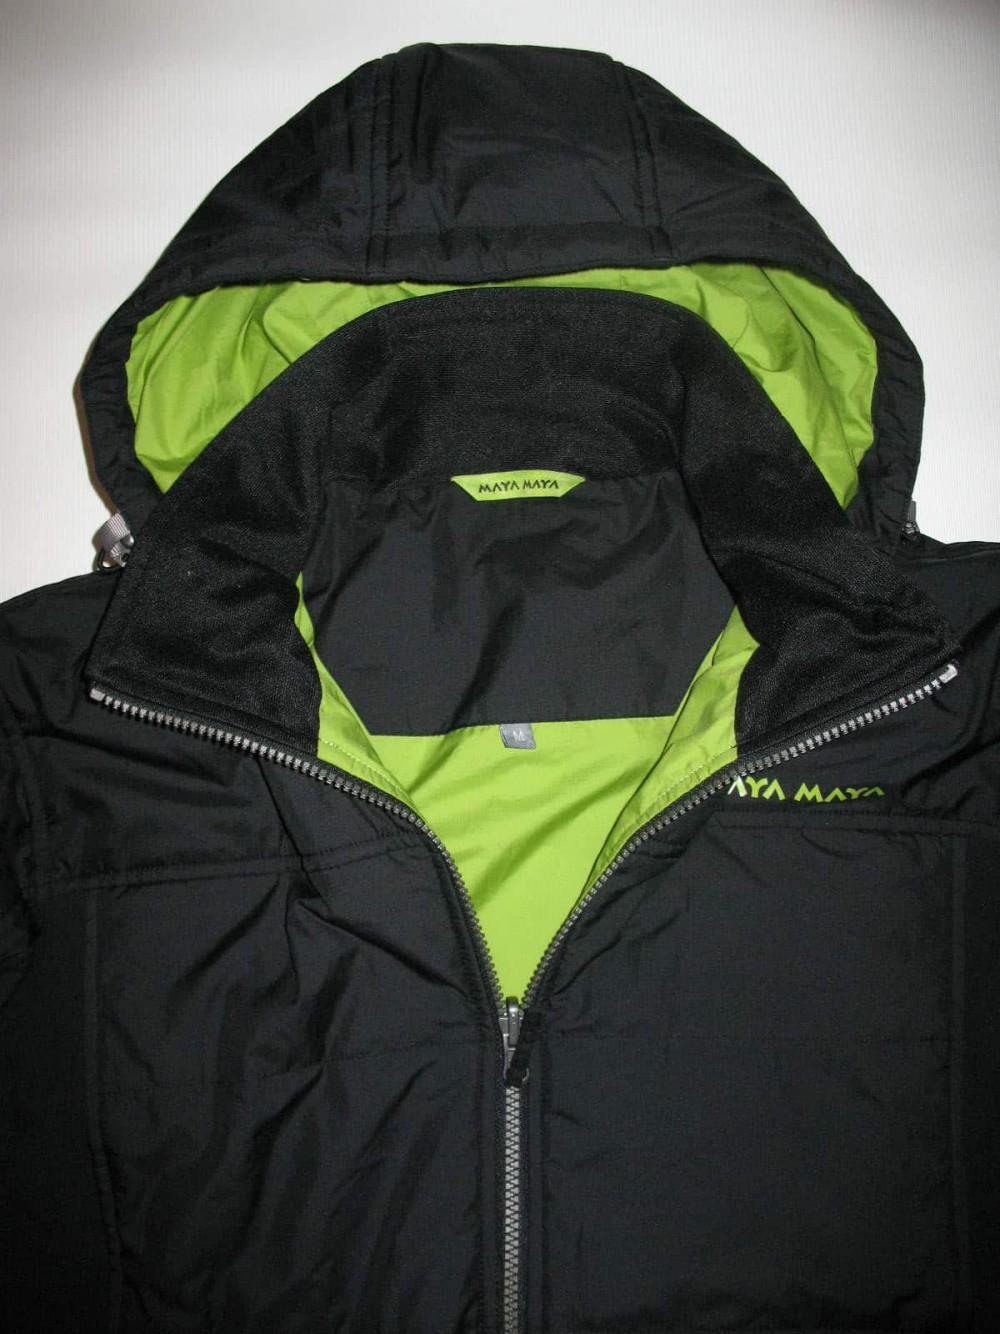 Куртка MAYA MAYA ultralight primaloft jacket (размер M) - 4